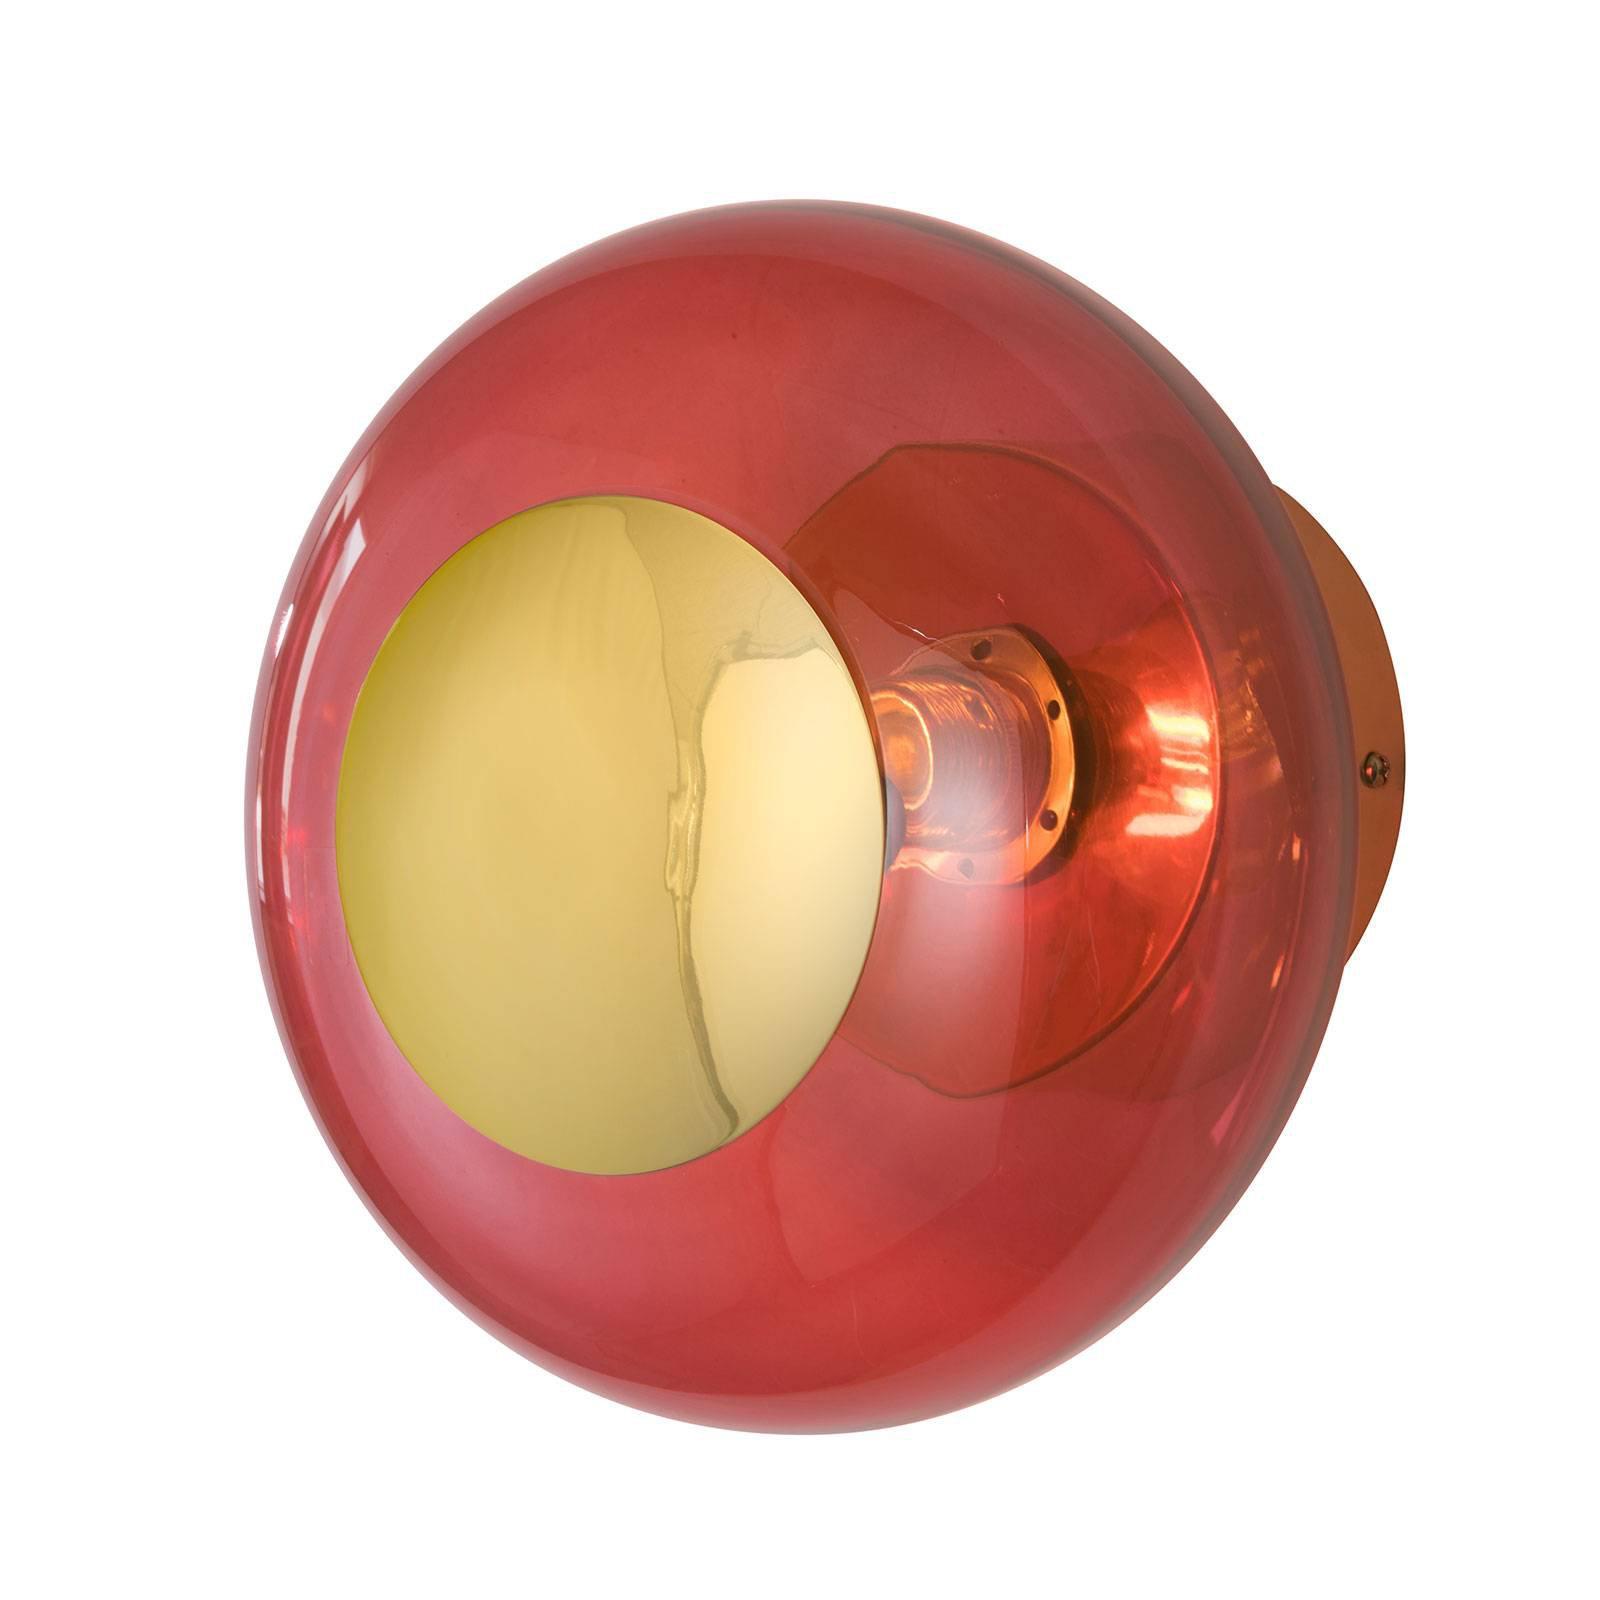 EBB & FLOW Horizon, fatning gull/rød, Ø 21 cm